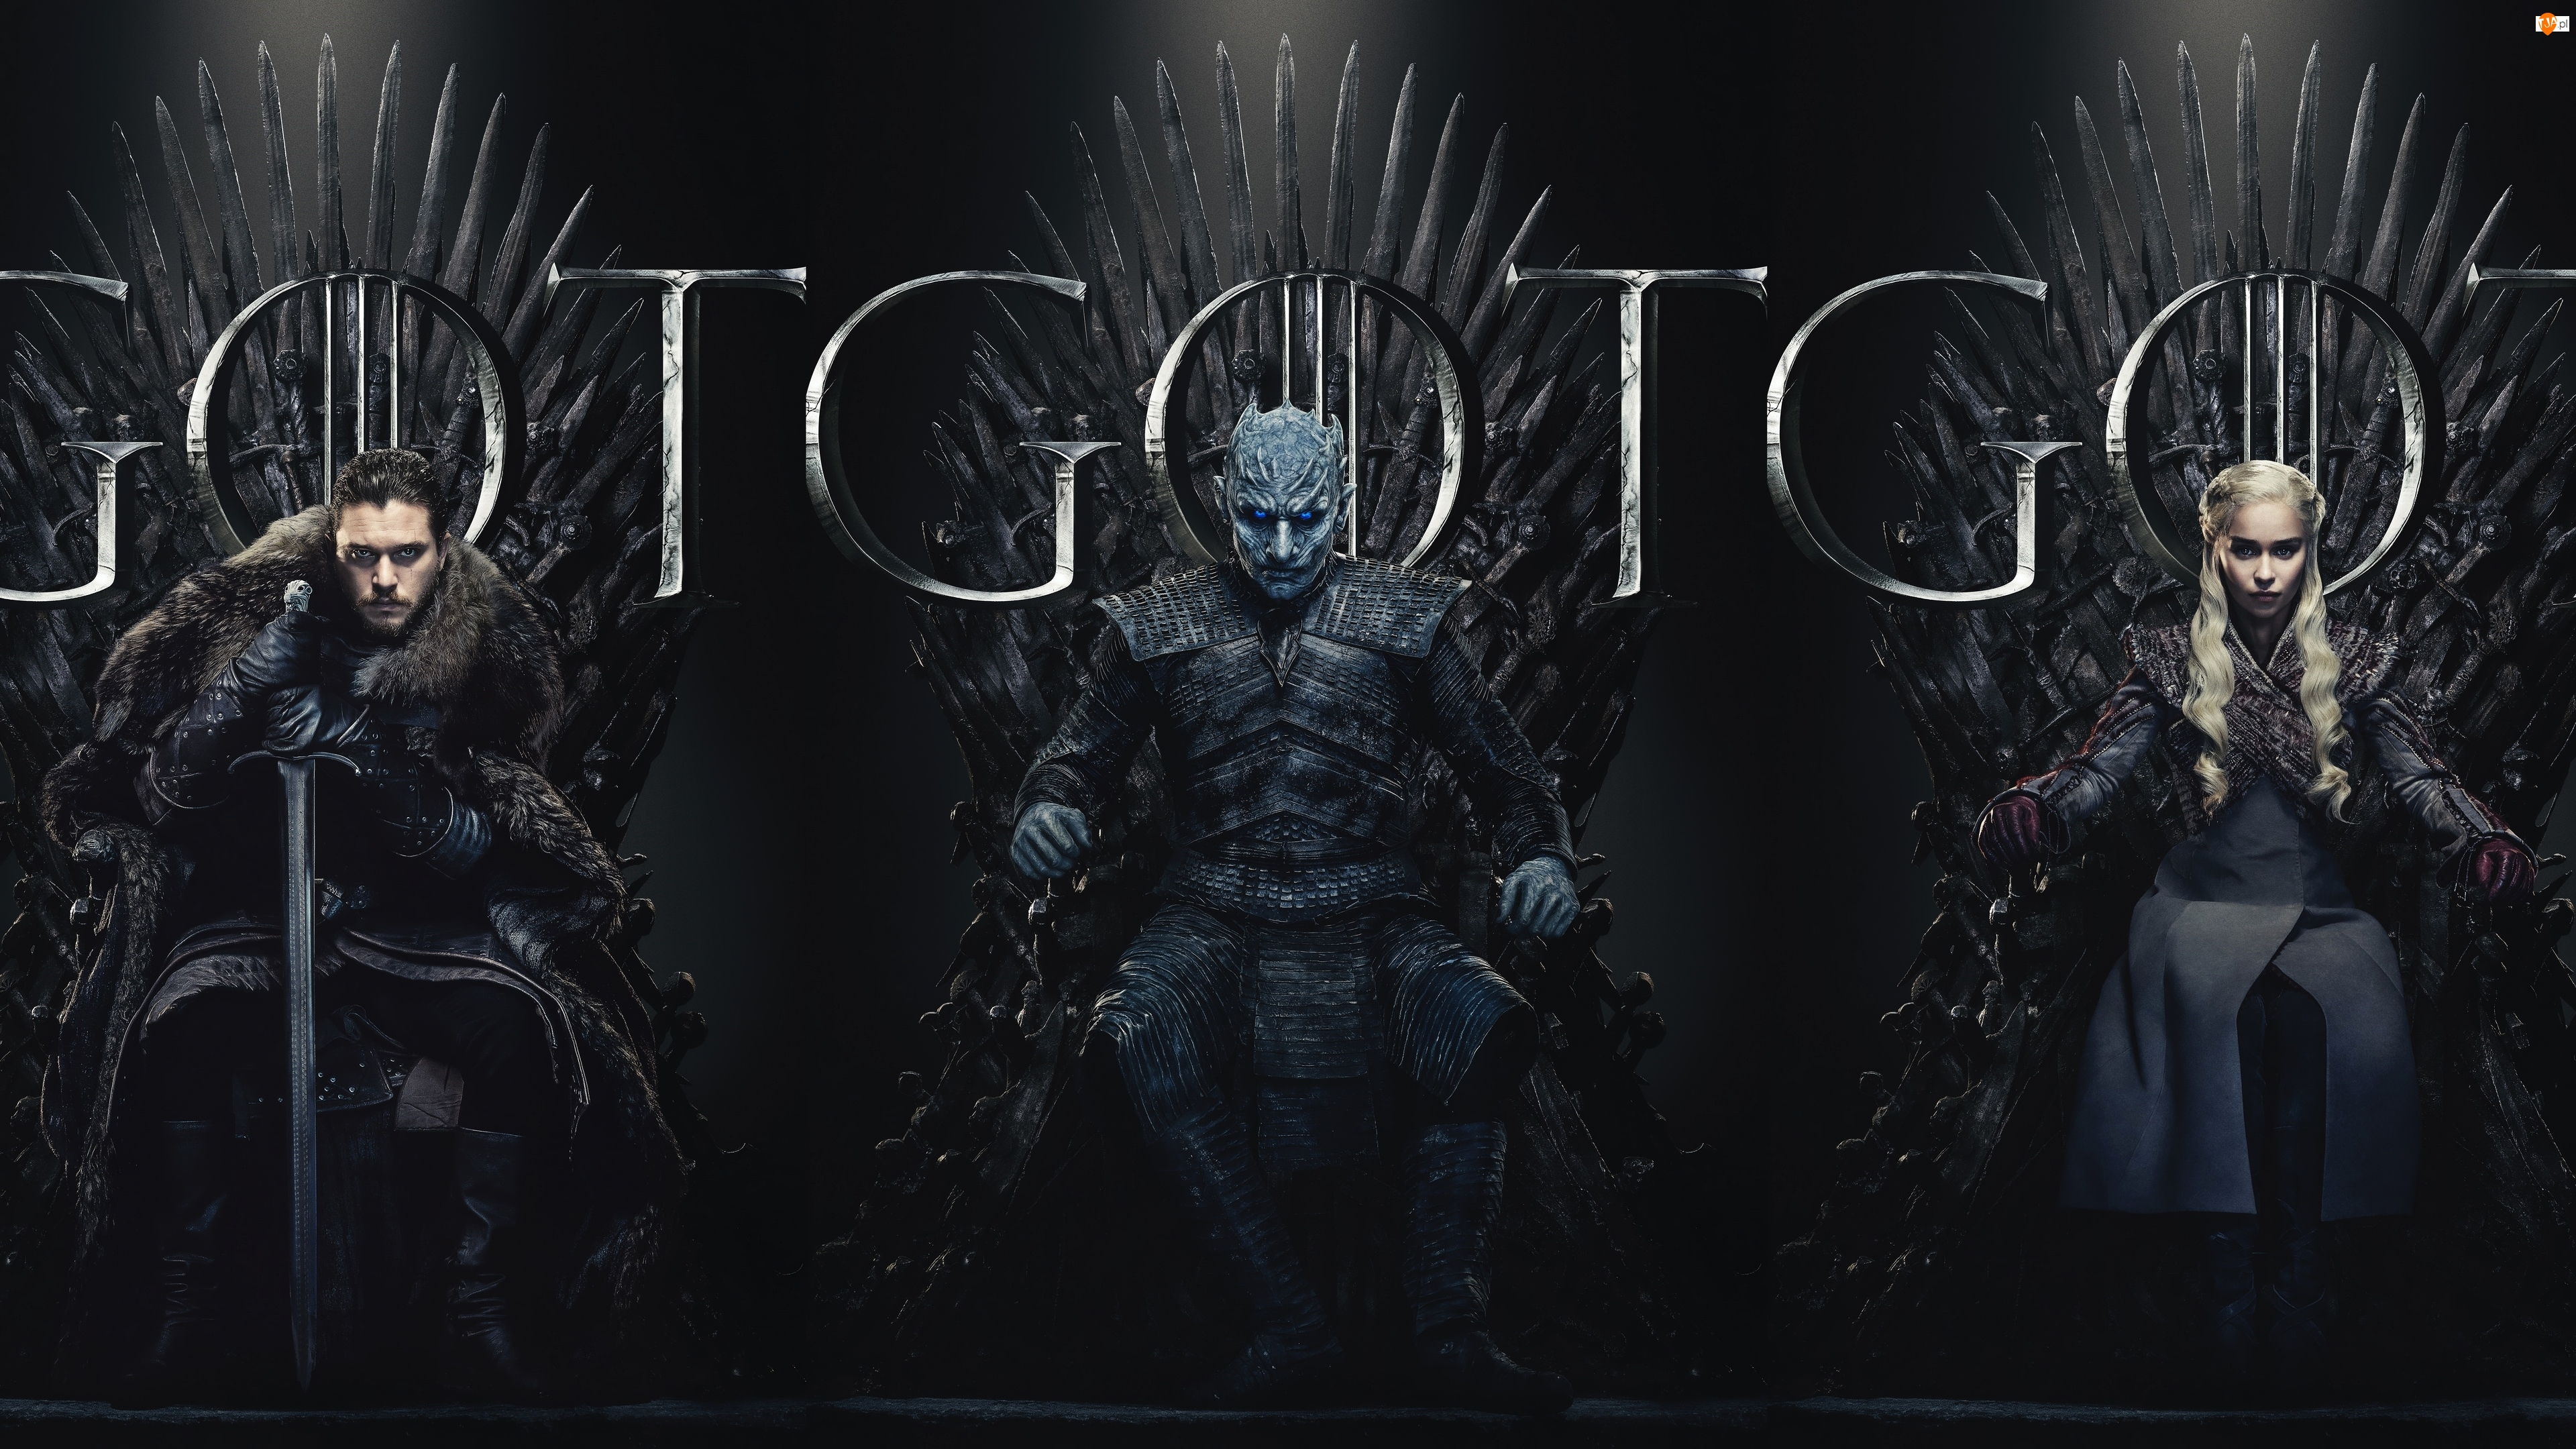 Emilia Clarke, Nocny Król, Daenerys Targaryen, Kit Harington, Gra o Tron, Serial, Jon Snow, Game of Thrones, Aktor, Aktorka